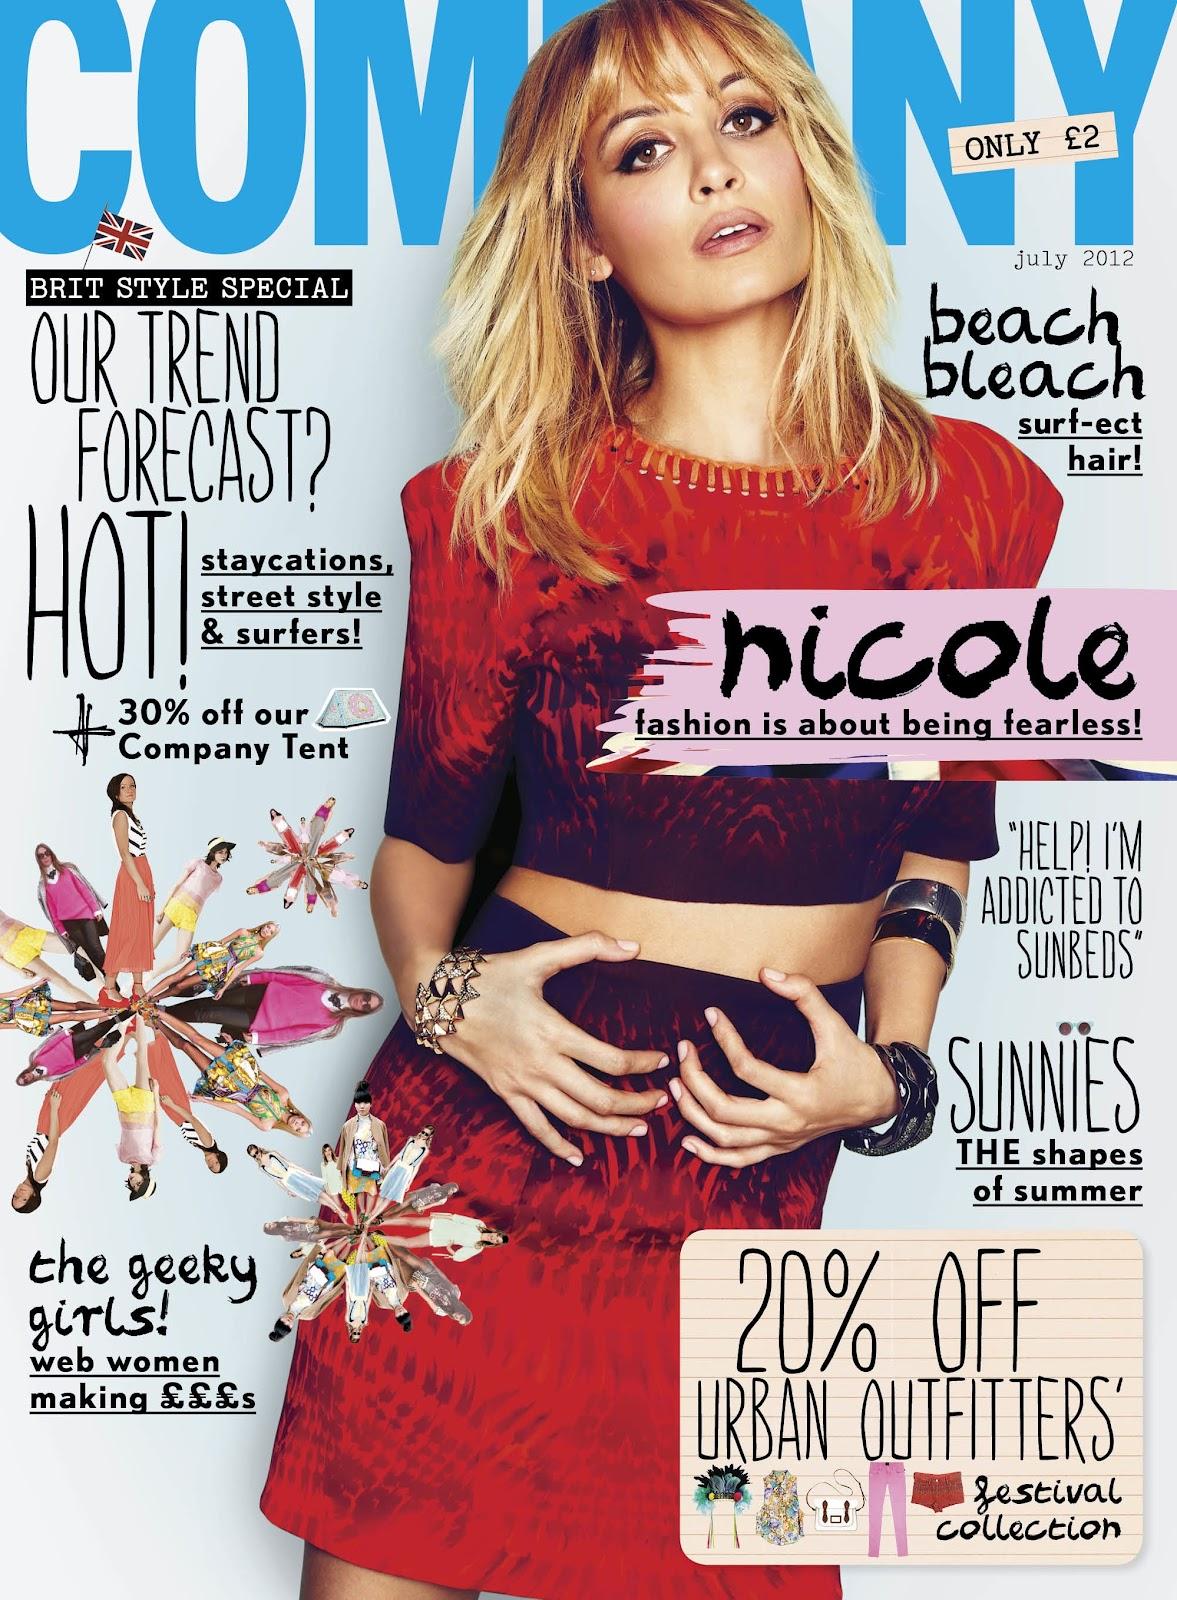 http://1.bp.blogspot.com/-L3CAx1GMOQI/T9DVmx-h2HI/AAAAAAAAPj8/CPEK59WfDfw/s1600/Nicole+Richie+Company+magazine+cover.jpg